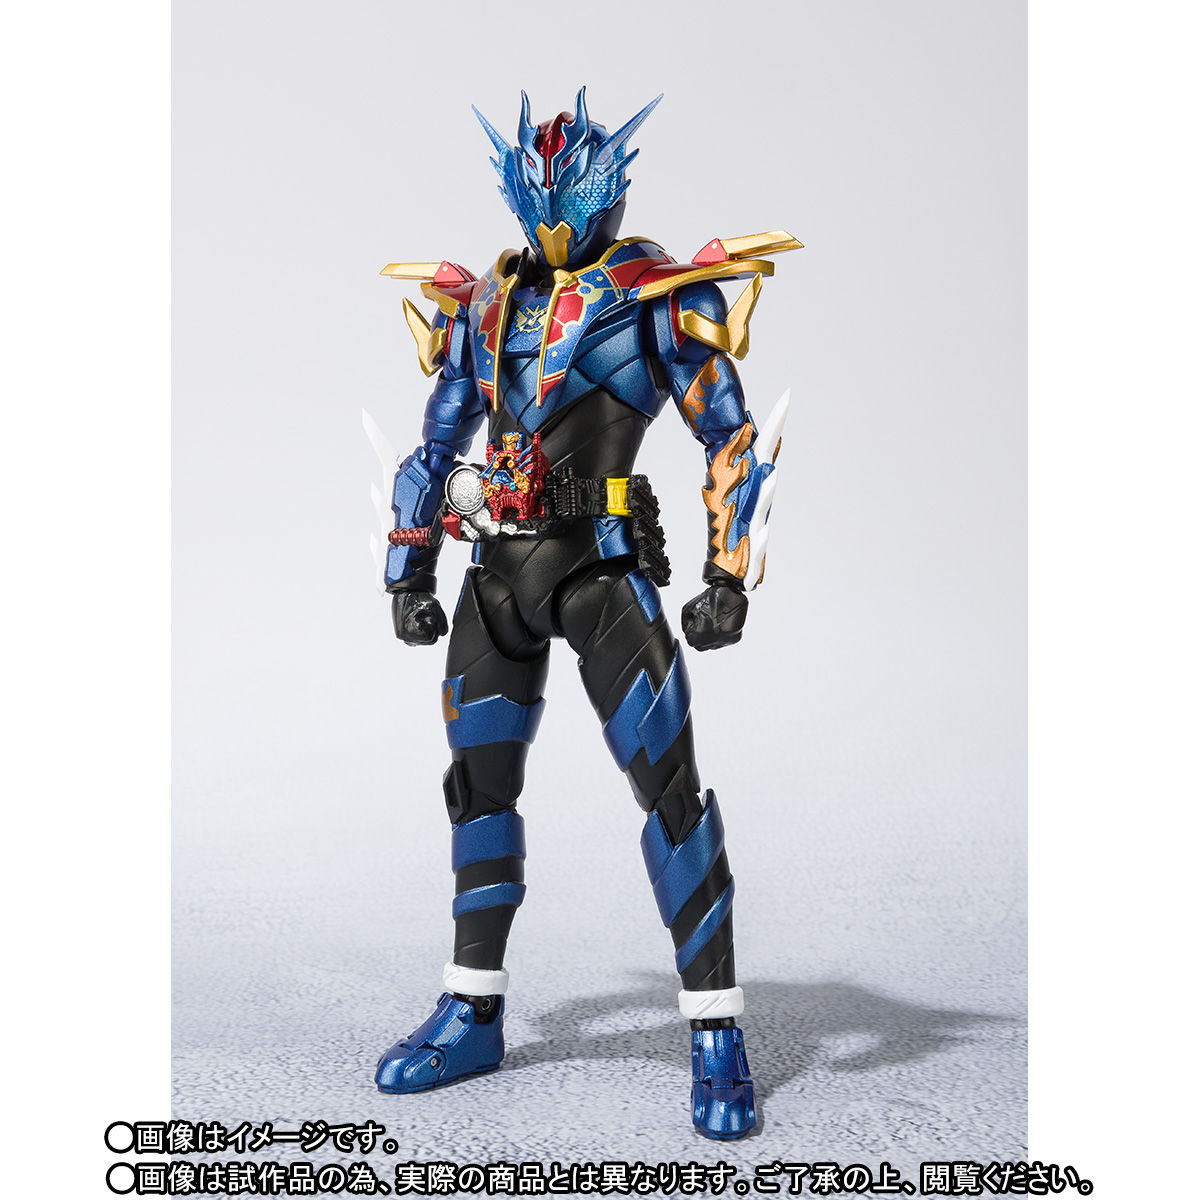 S.H.フィギュアーツ『仮面ライダーグレートクローズ』可動フィギュア-003